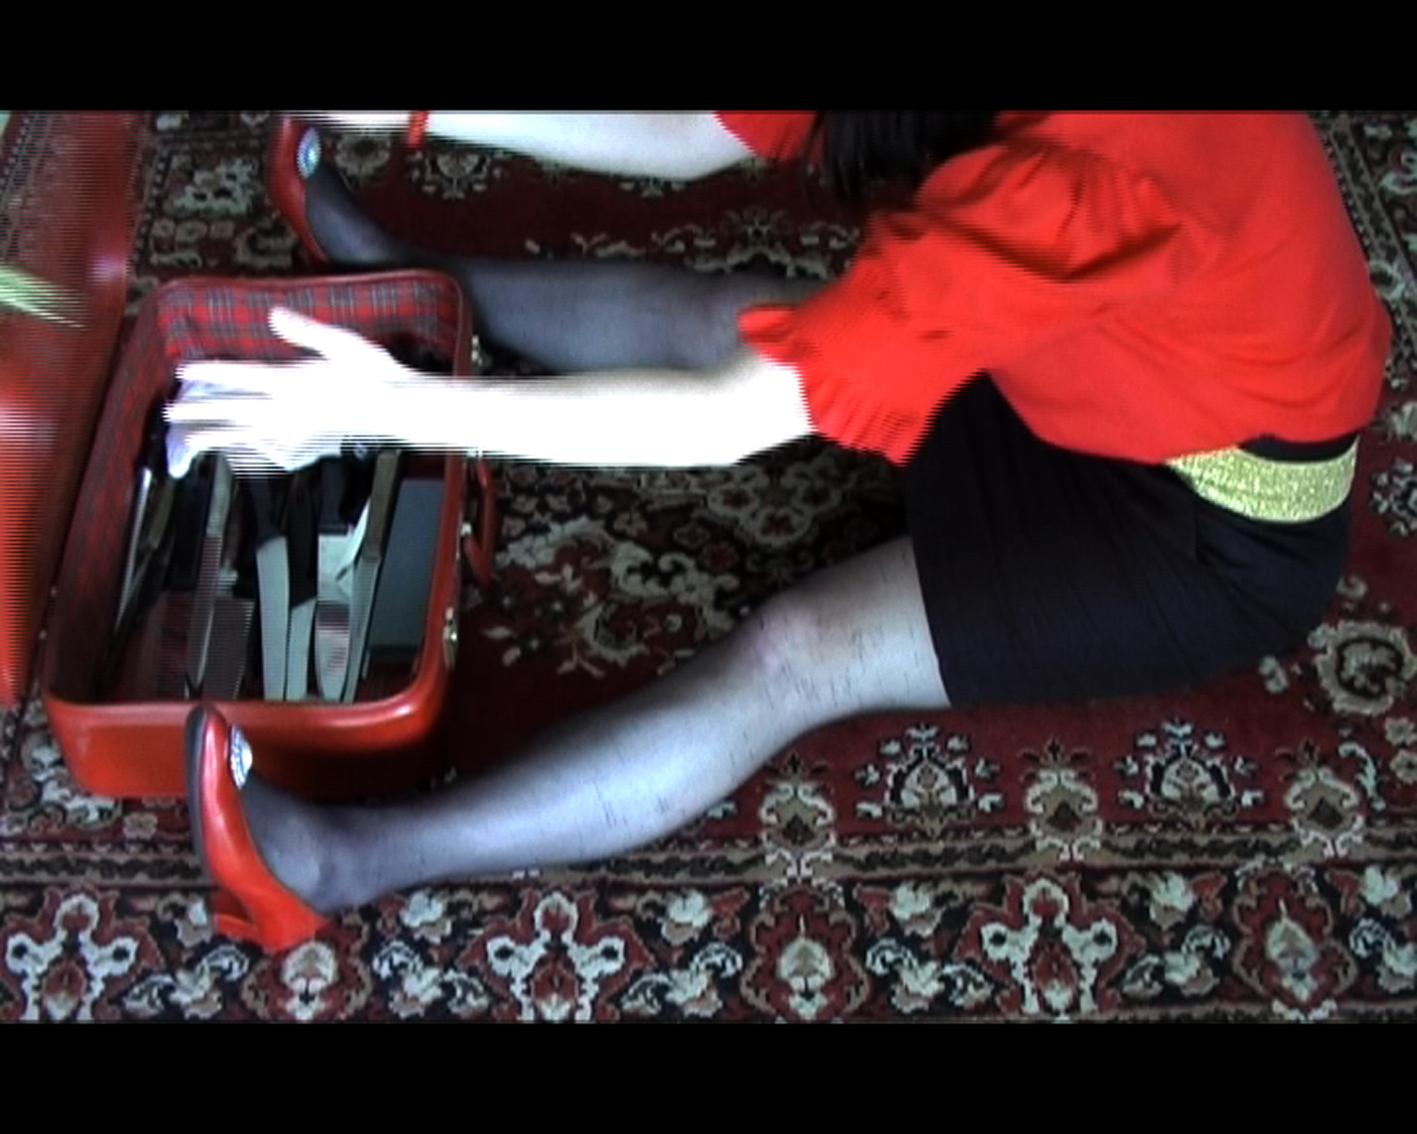 Nina Lassila: Woman with Knife (2010)